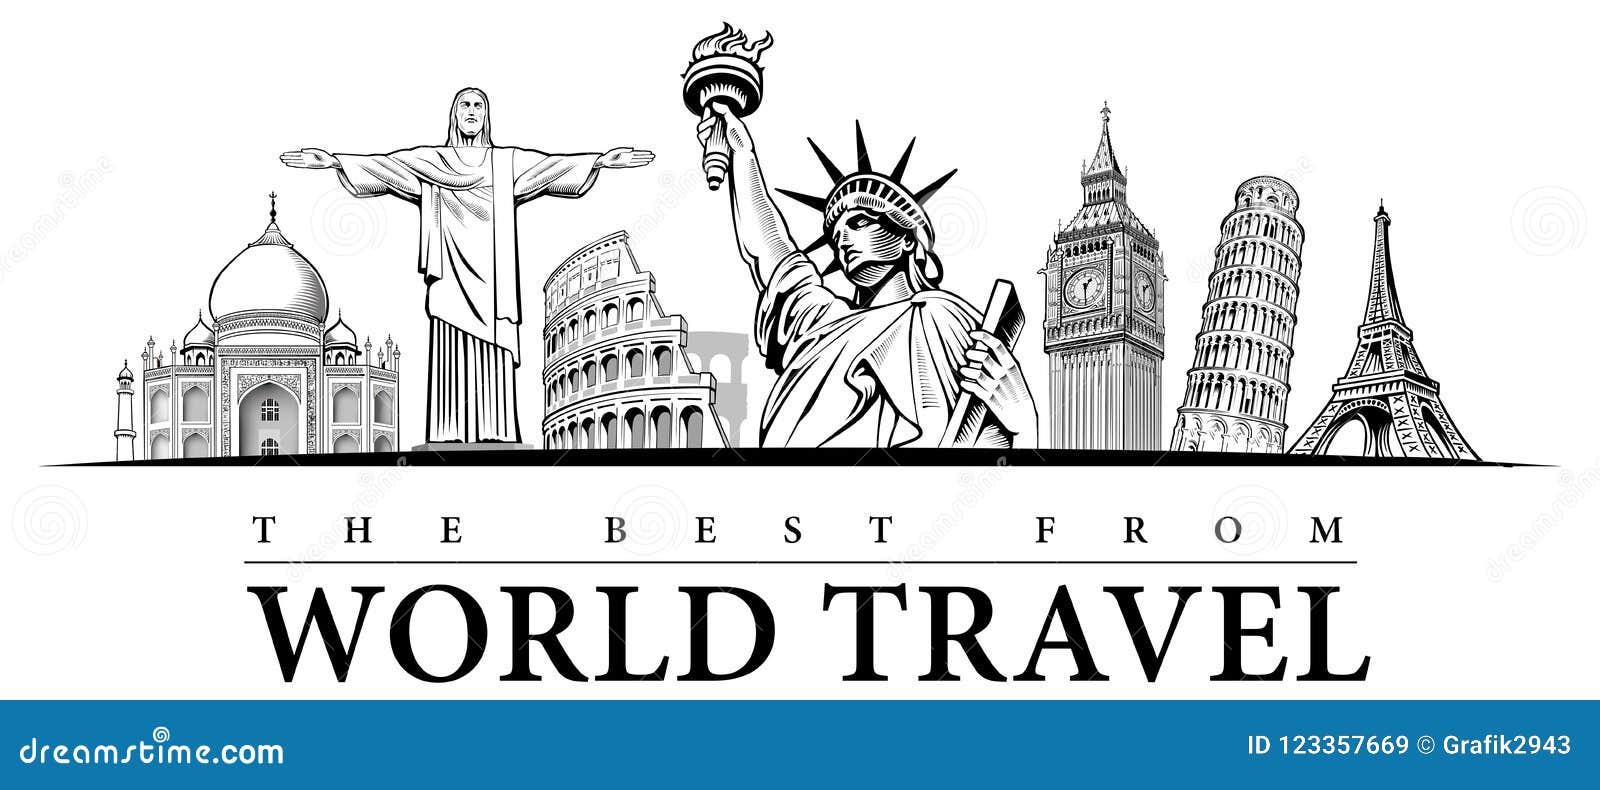 PlacesNYC destino-famoso del viaje, Londres Big Ben, Roma-coliseo, torre de París-Eiffel, Rio de Janeiro-Jesus Statue, NYC-estatu